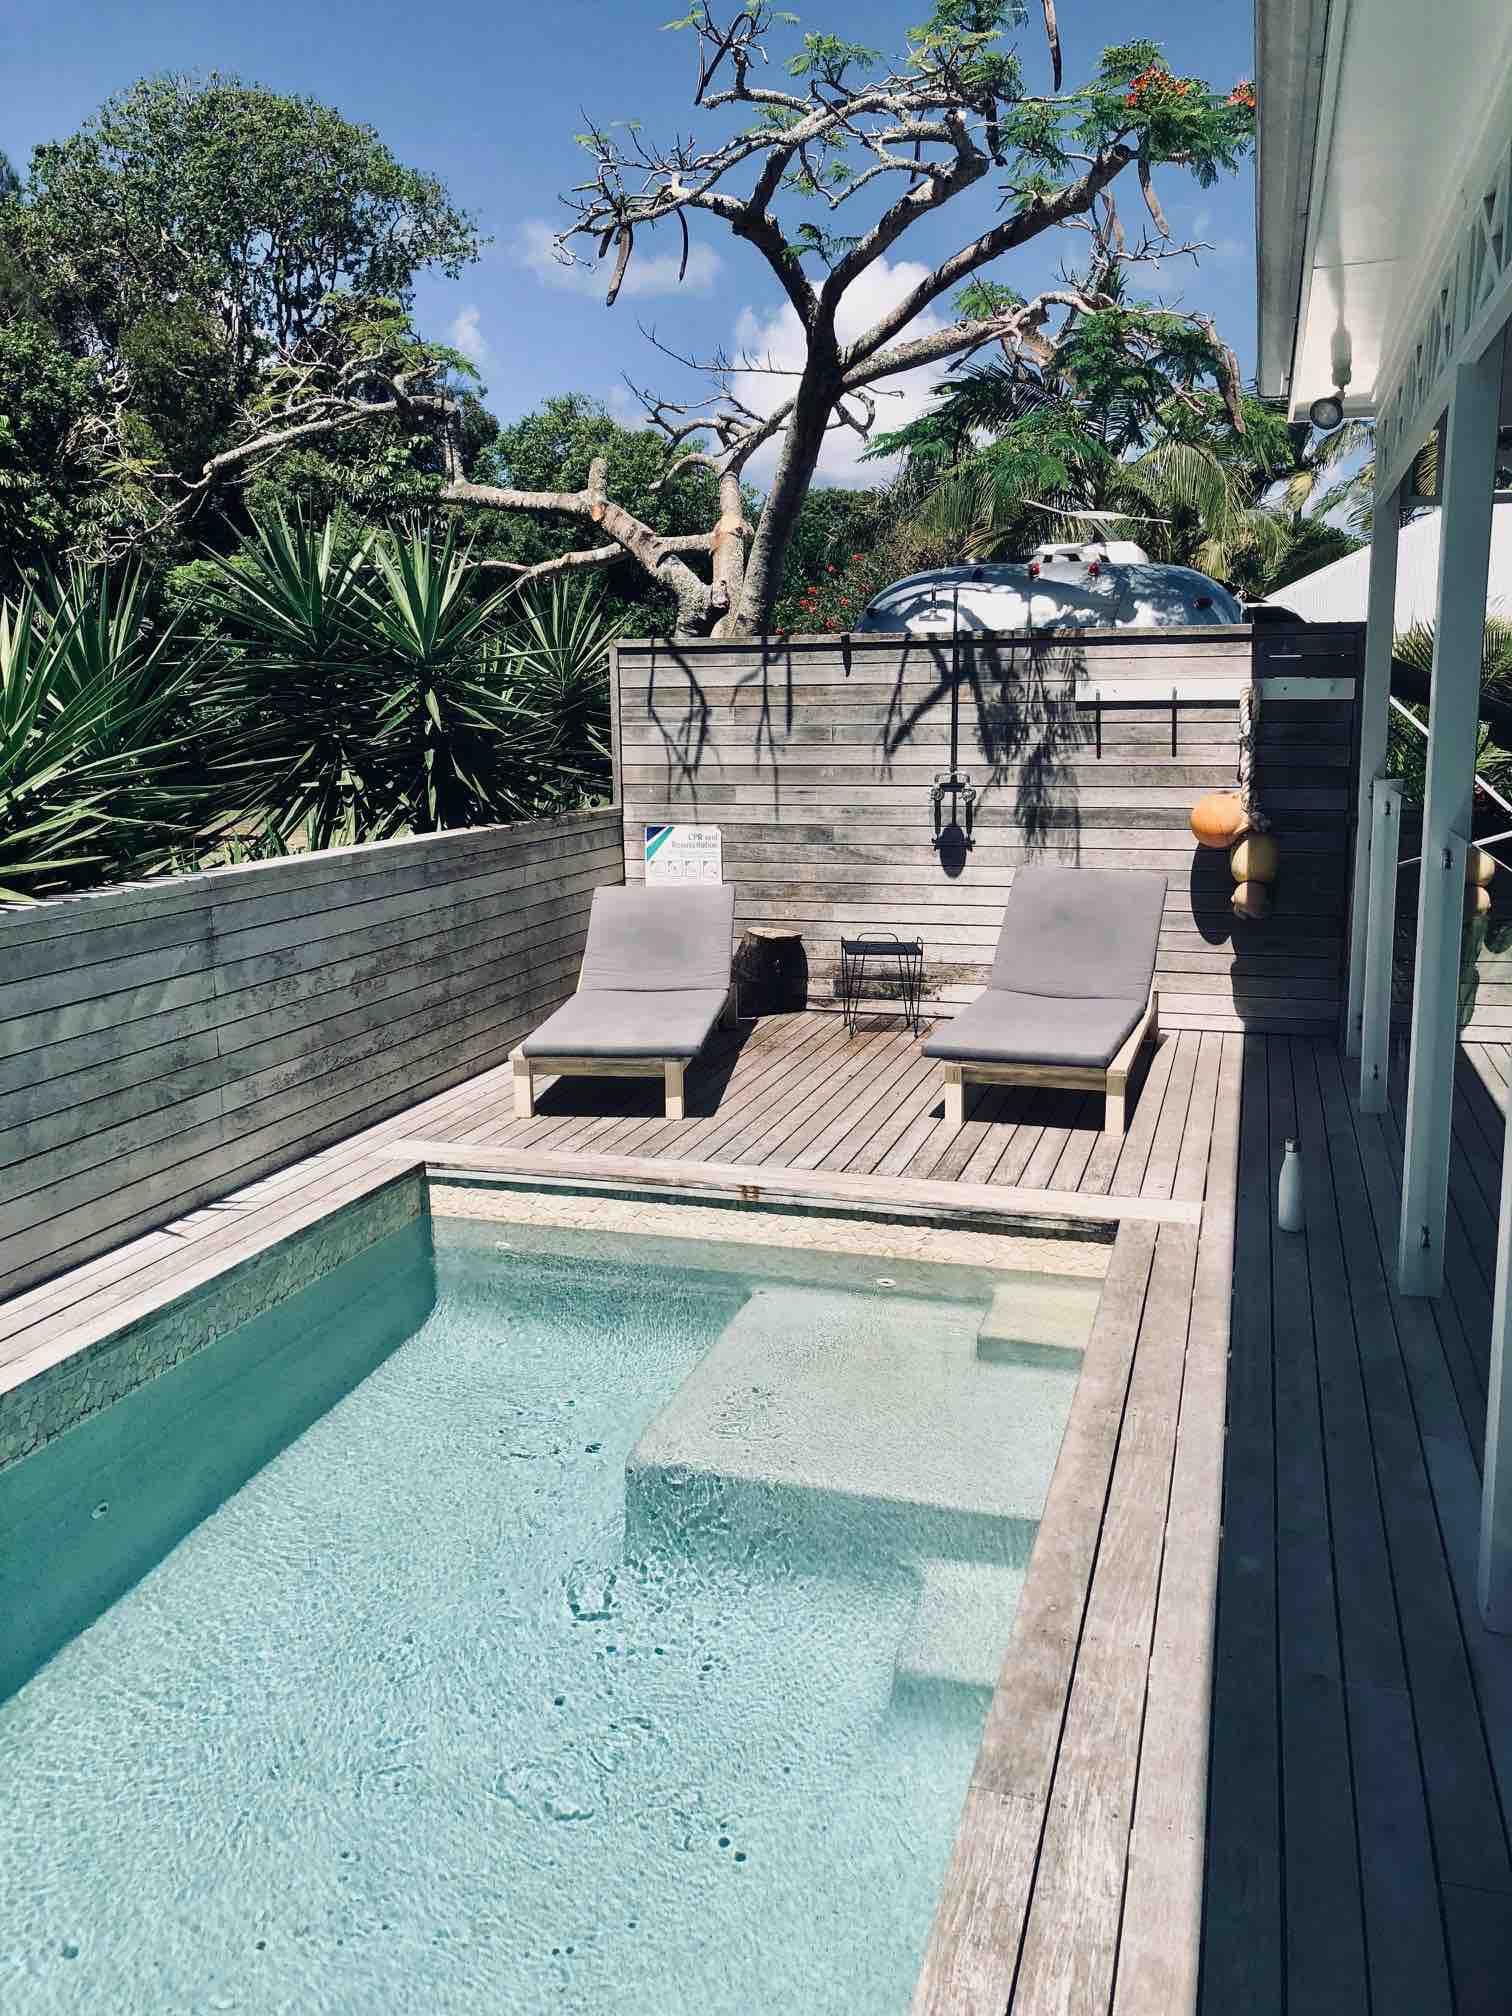 Plung Pool | The Atlantic Byron Bay